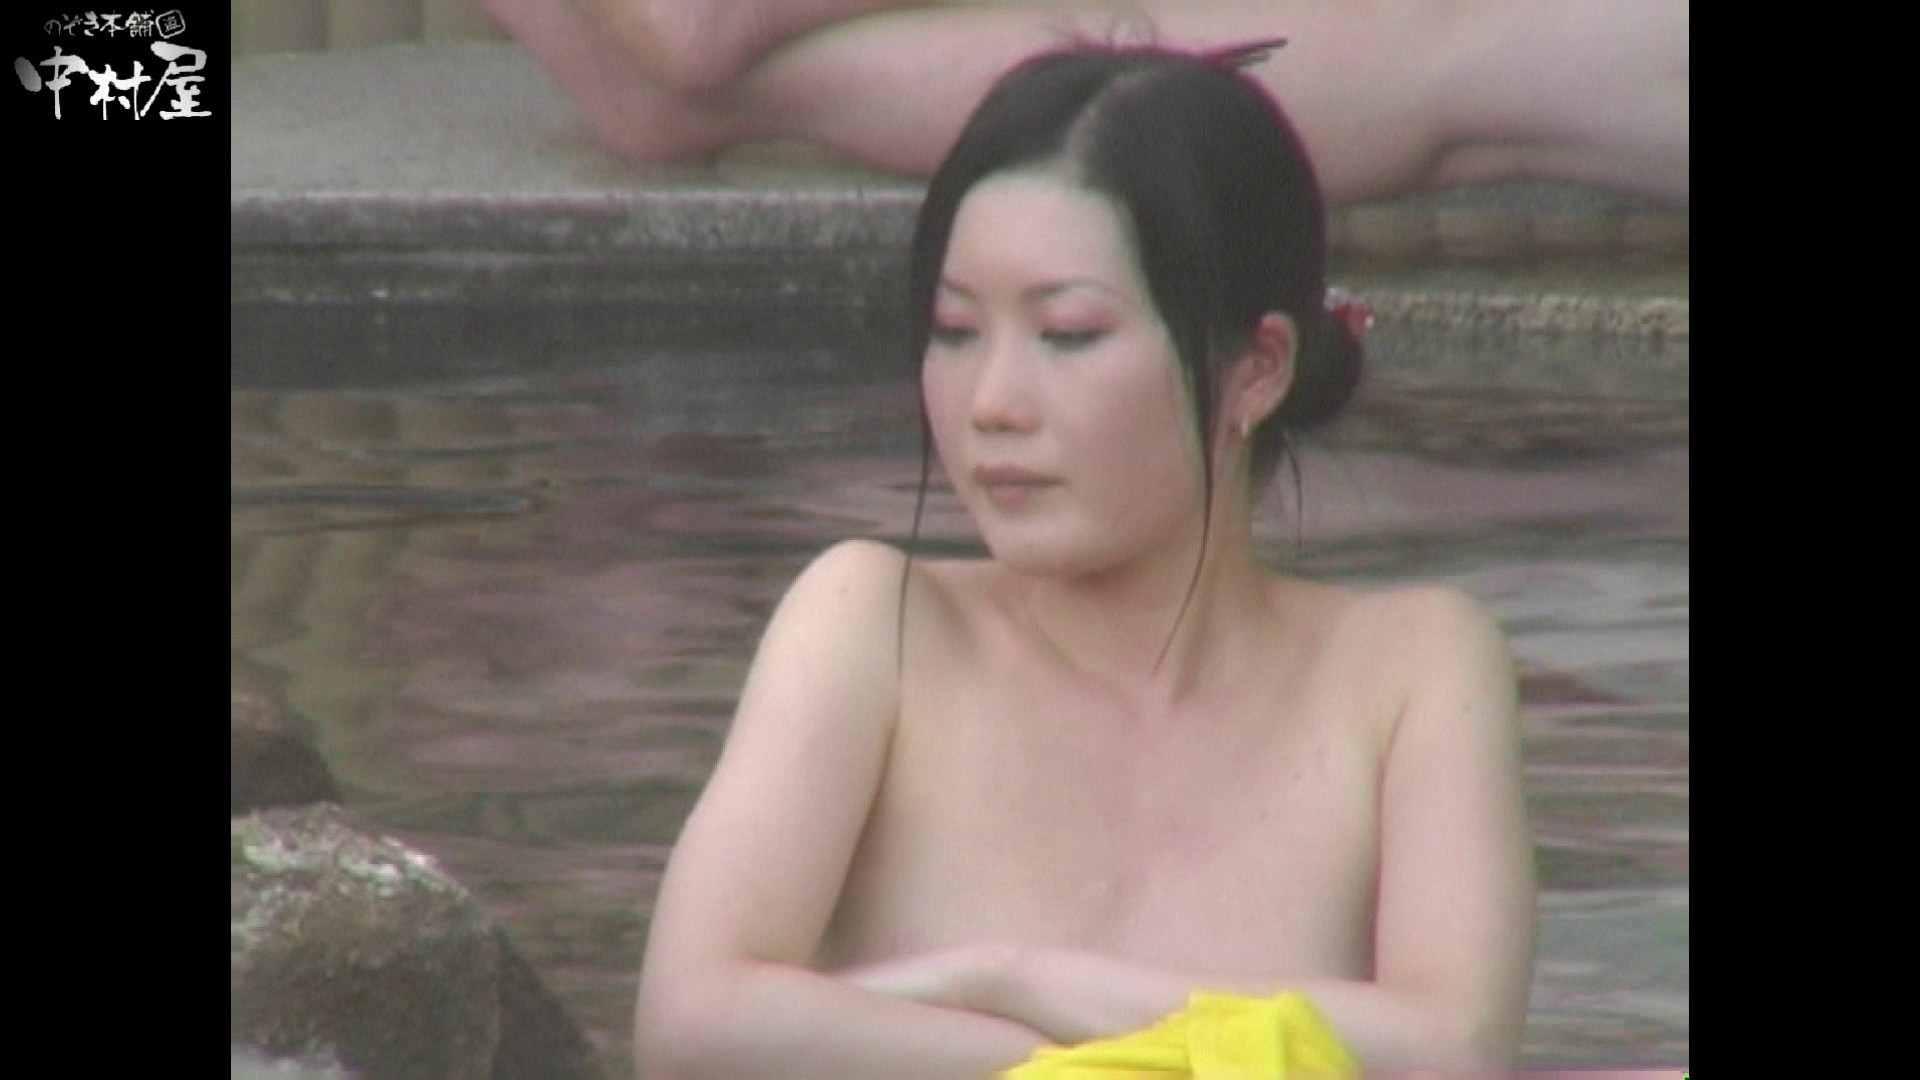 Aquaな露天風呂Vol.940 OLセックス  98画像 54